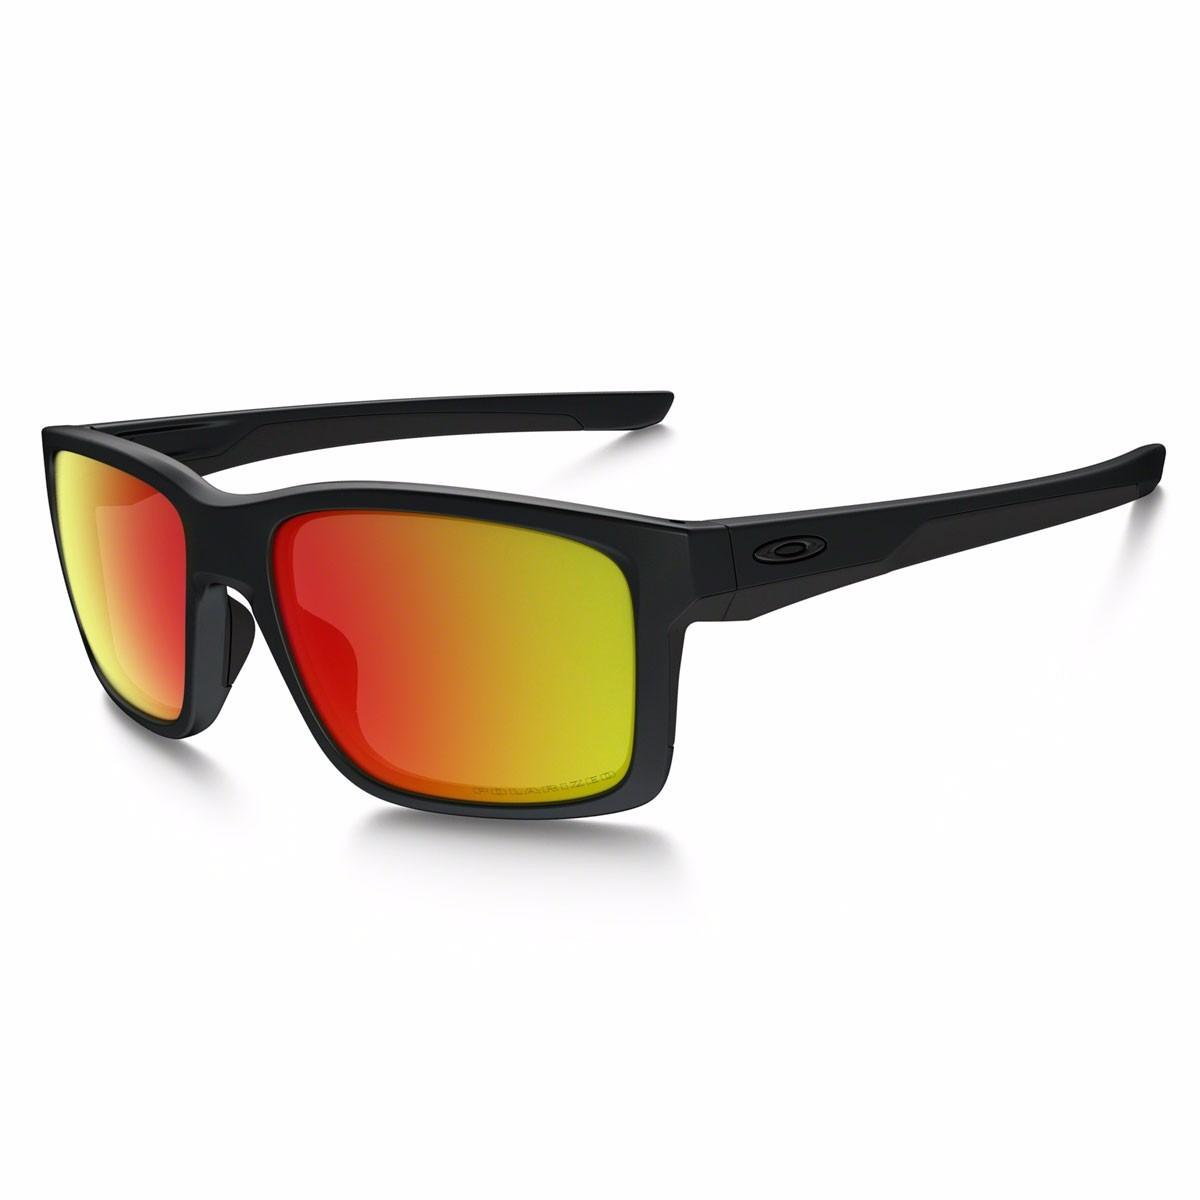 9ebc2259b8d25 Óculos Oakley Mainlink Matte Black   Ruby Iridium Polarized - R  660 ...